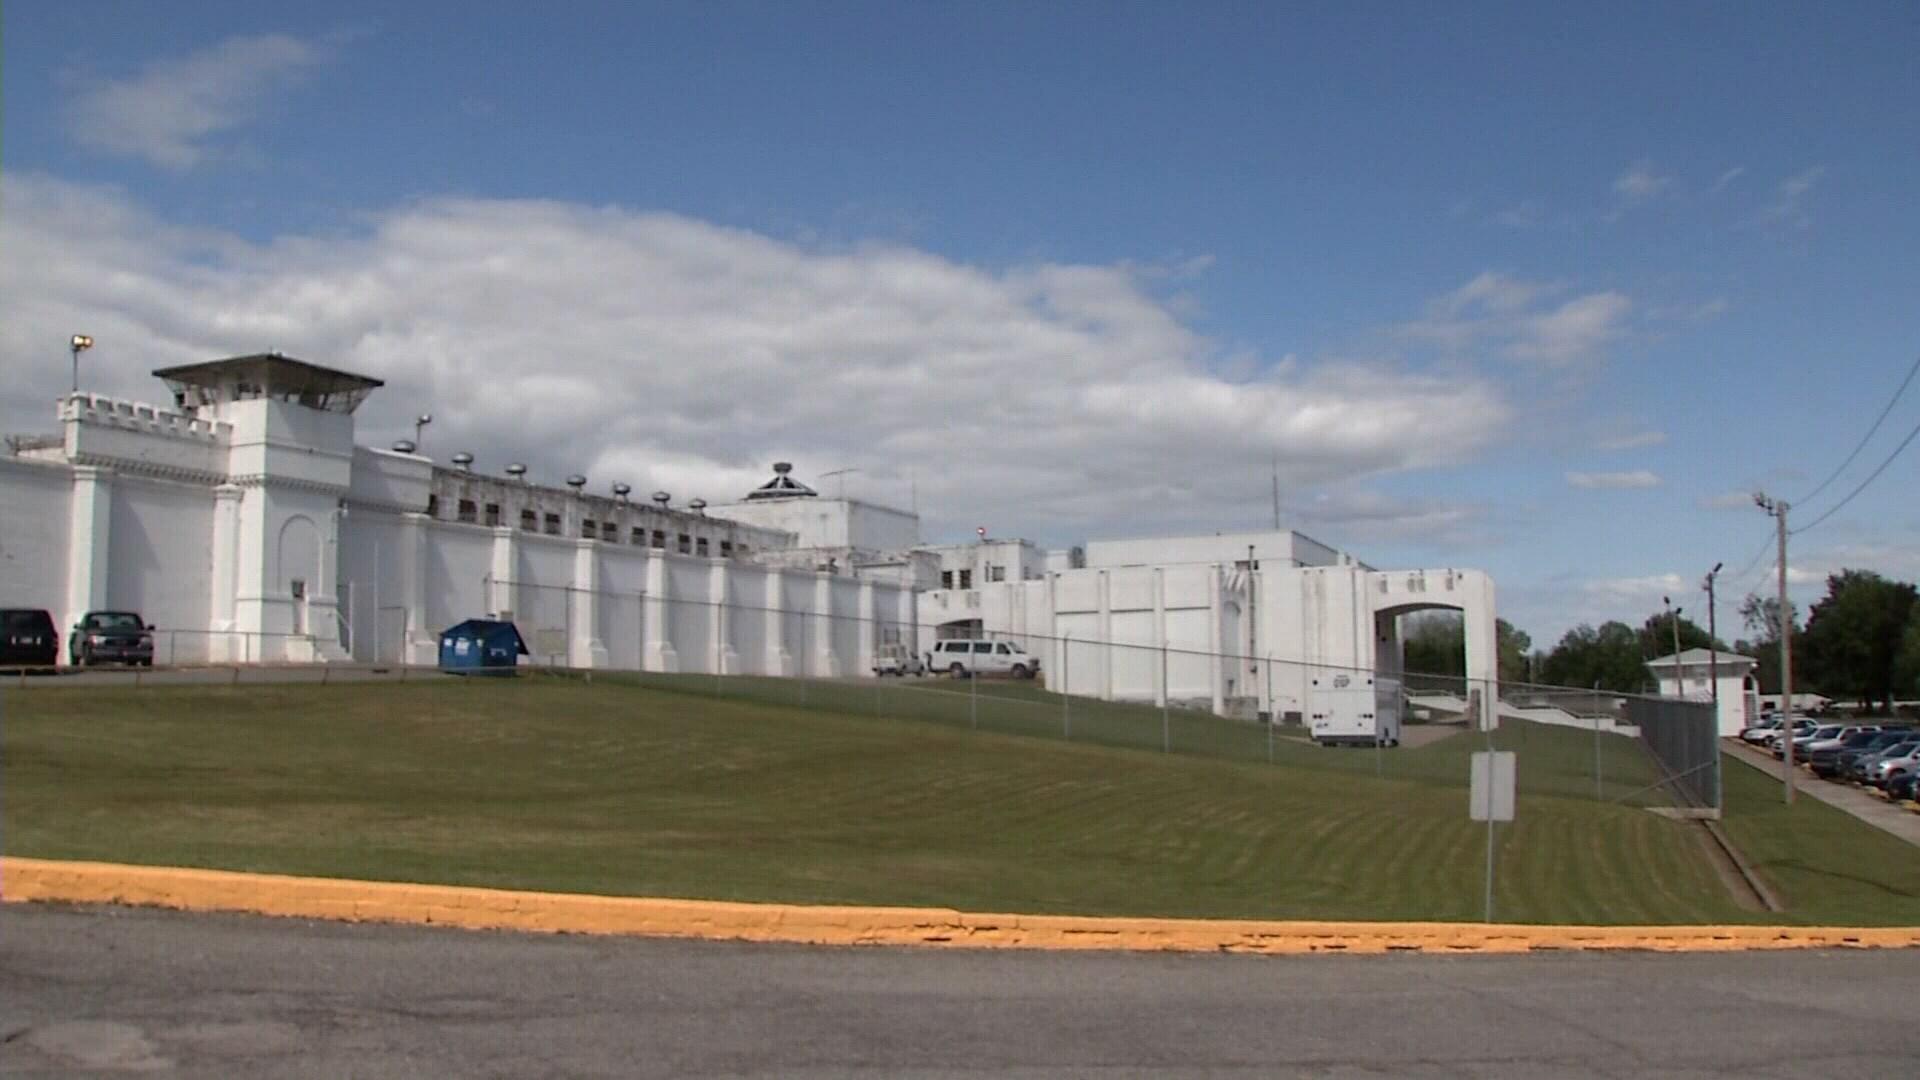 McAlester prison